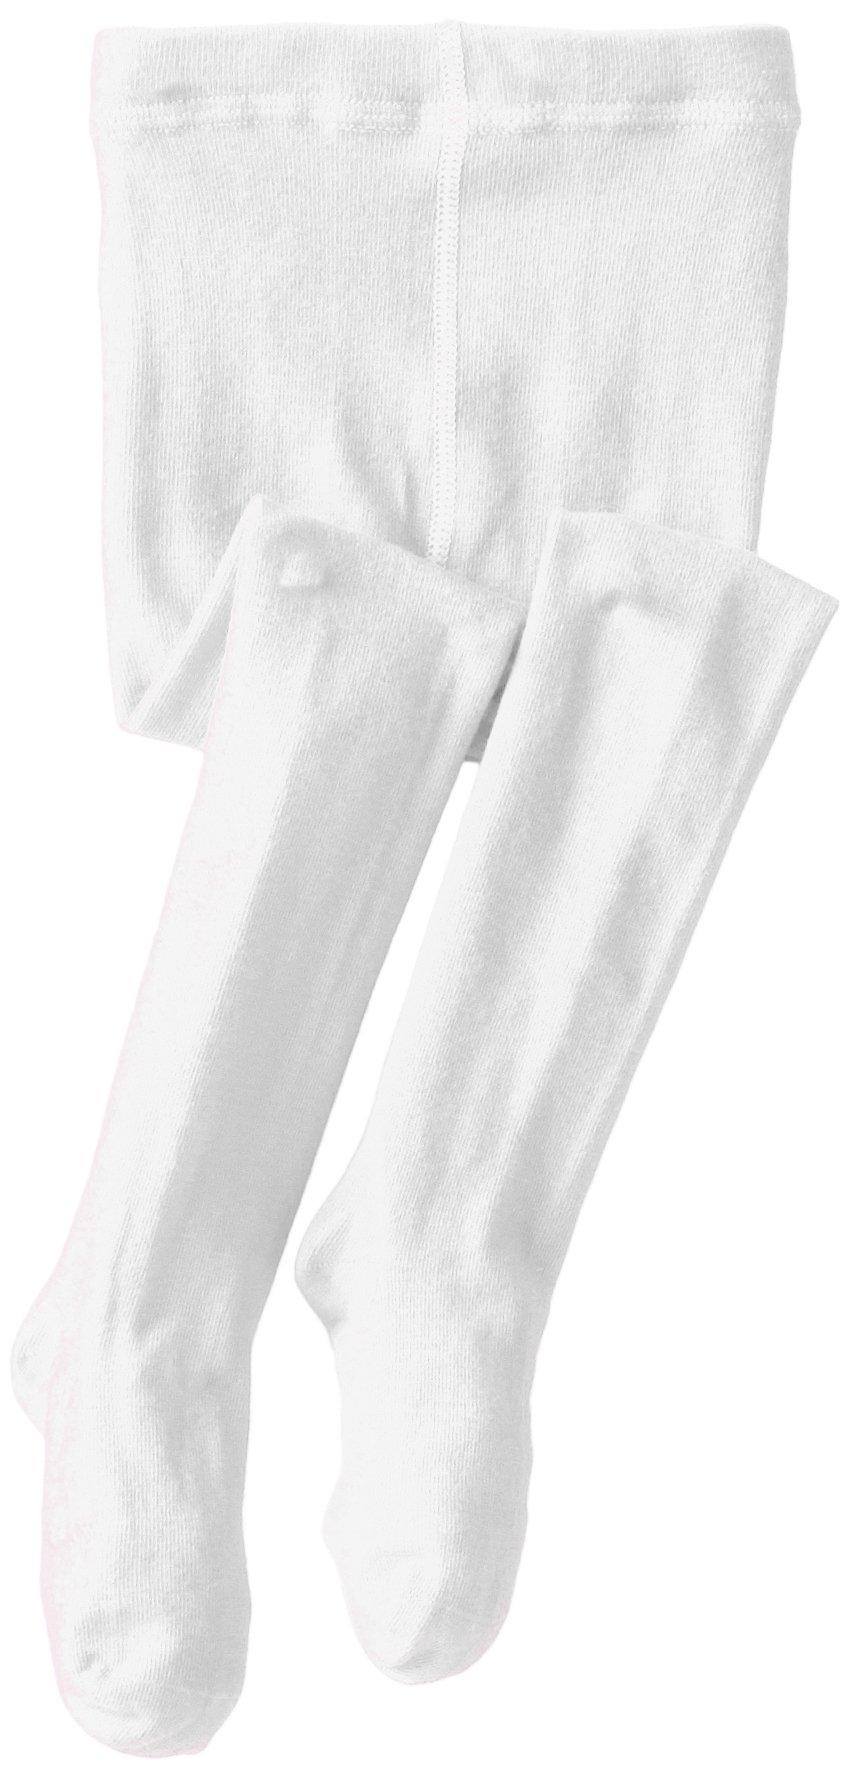 Jefferies Socks Little Girls'  Seamless Organic Cotton Tights, White, 2-4 Years